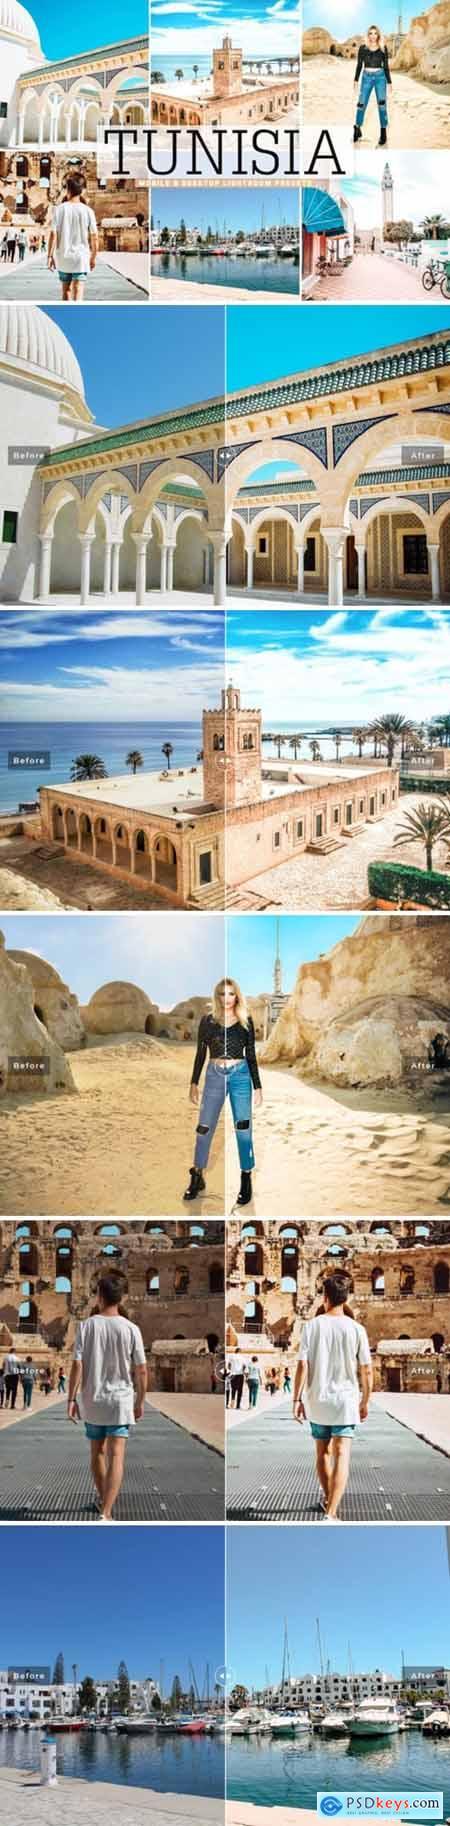 Tunisia Pro Lightroom Presets 6565313